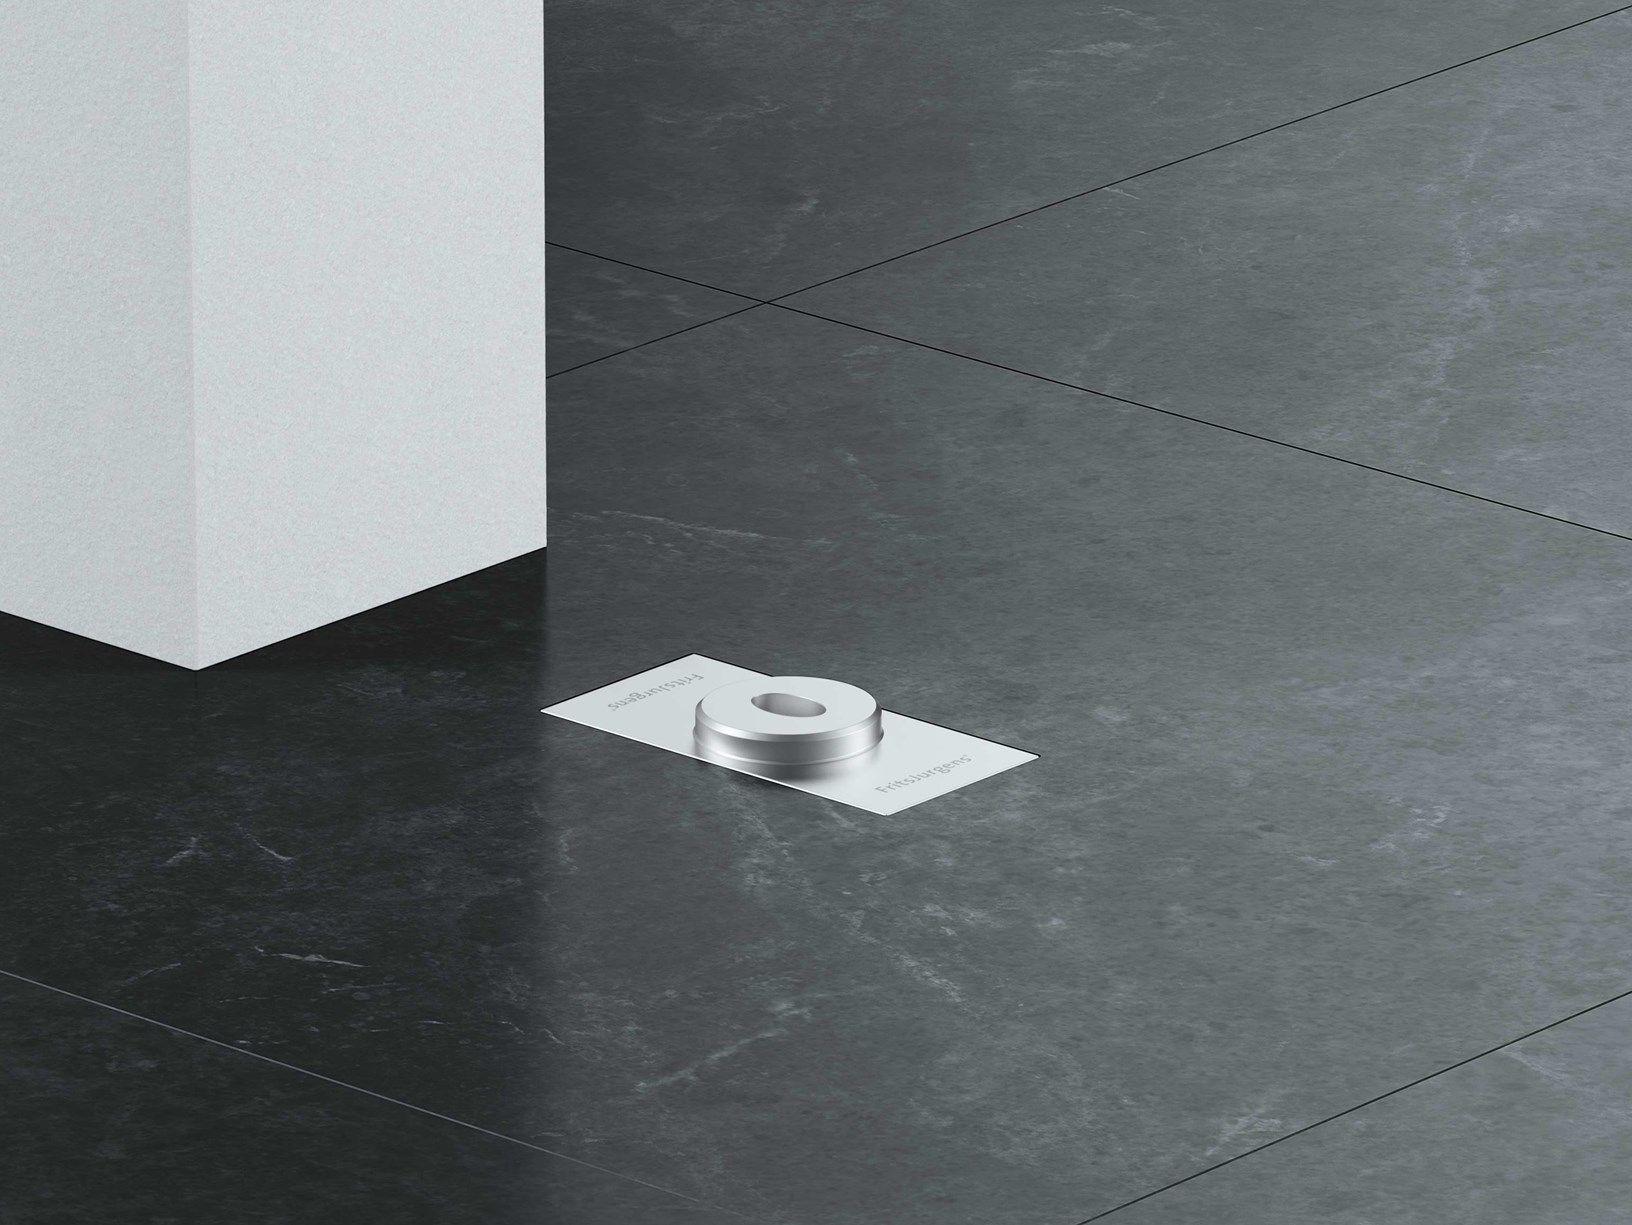 FritsJurgens lancia una nuova piastra a pavimento